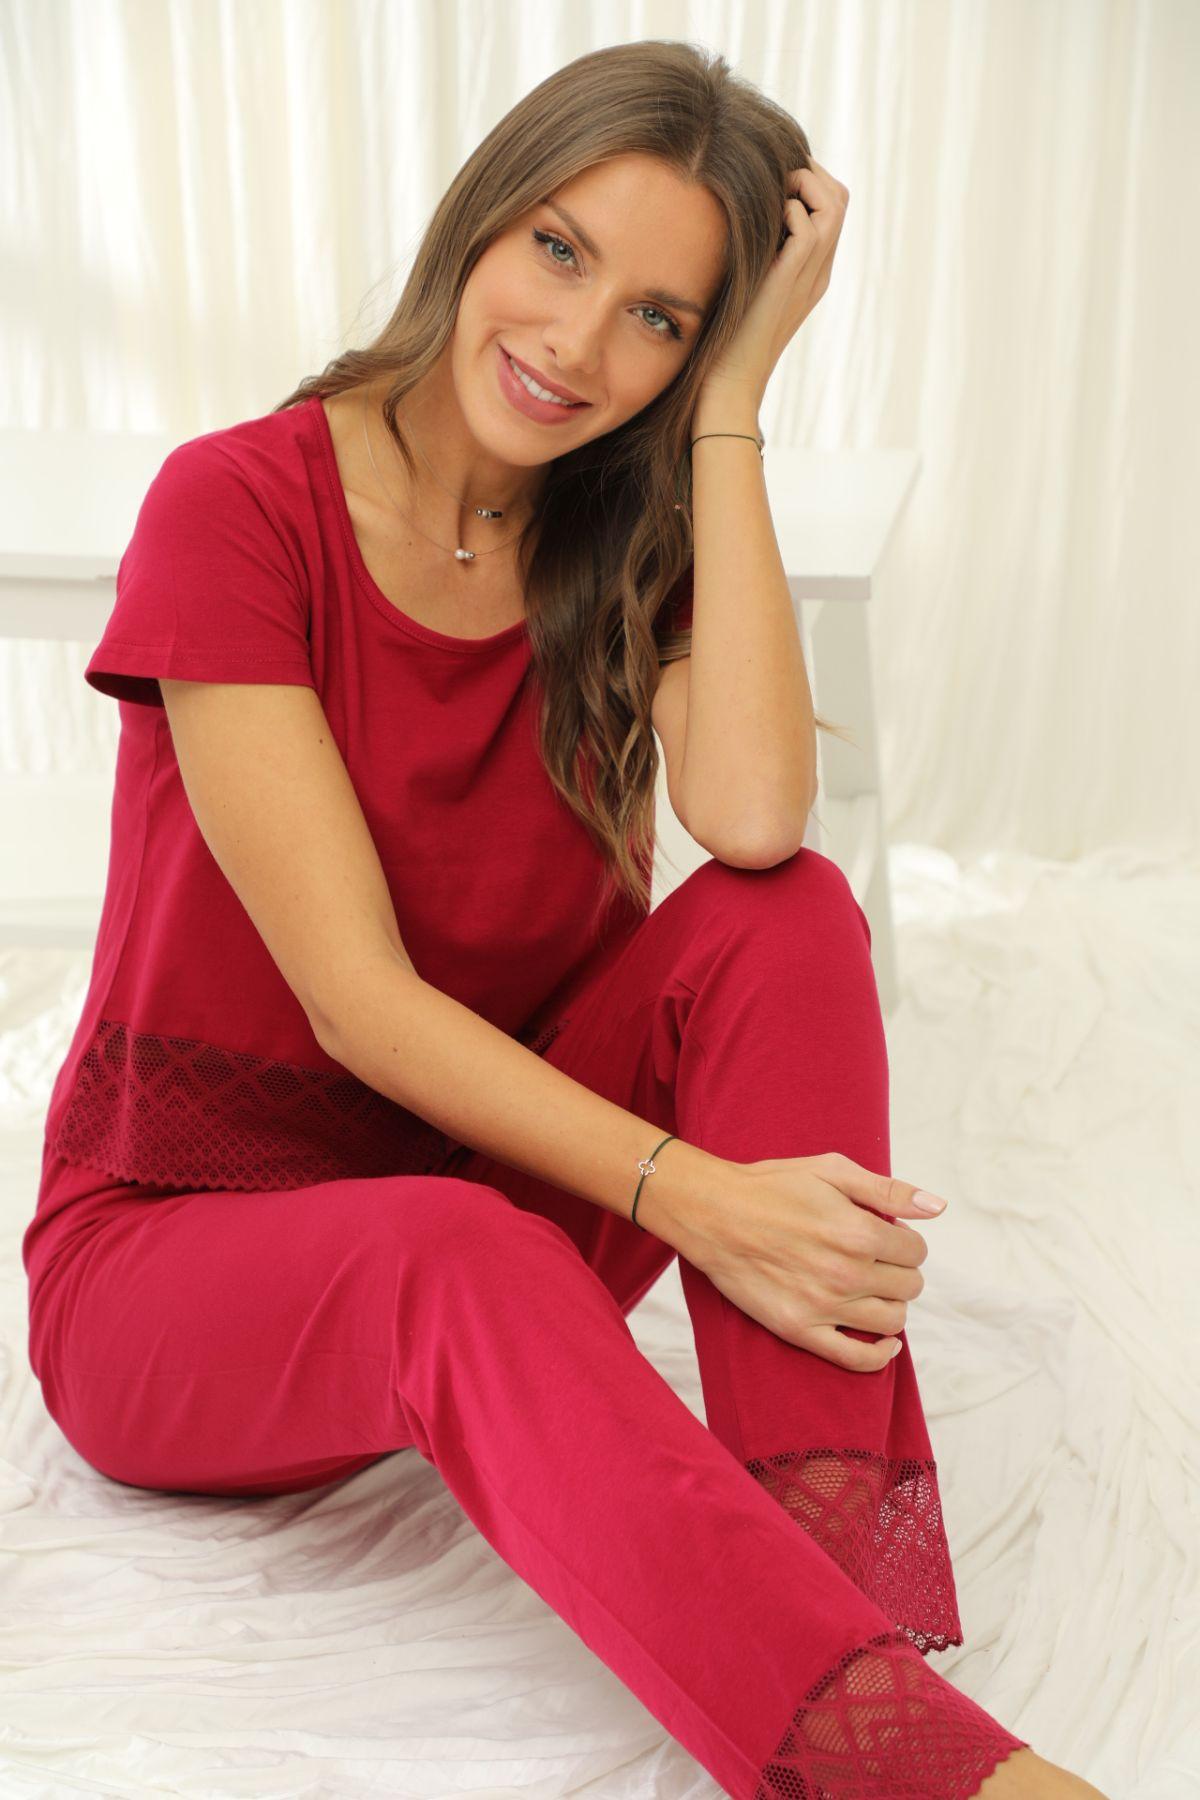 SIYAH INCI - Kısa Kollu Dantelli Pamuklu Likralı Pijama Takım 21133672